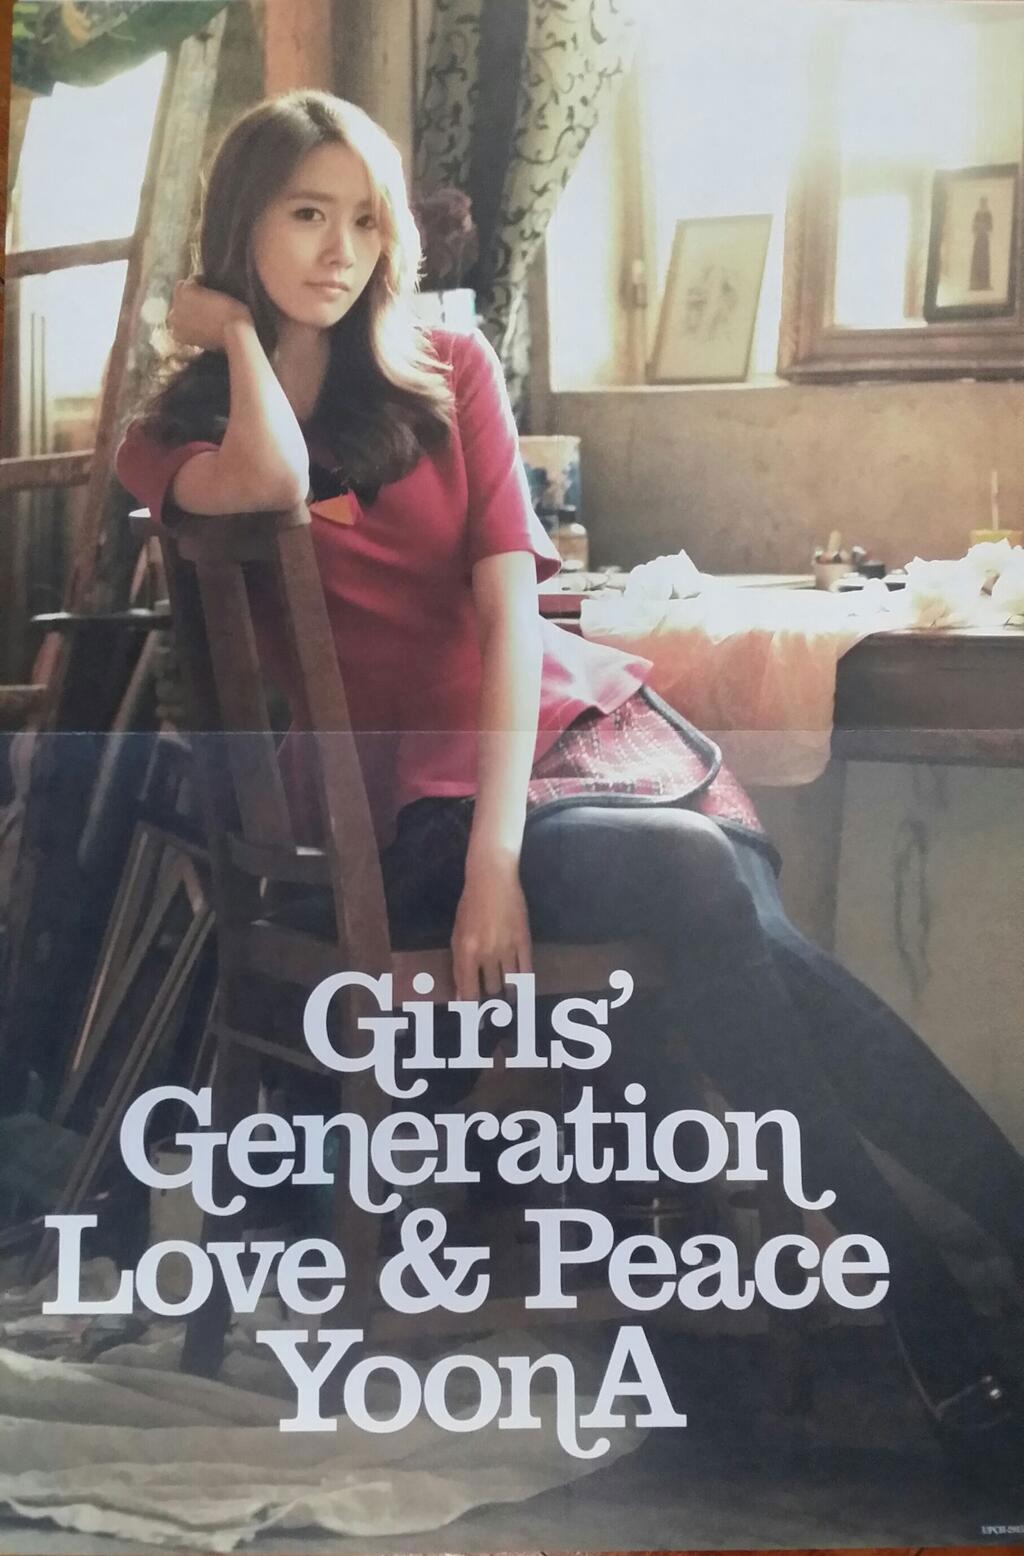 Girls Generation Album Girls Generation Yoona Love